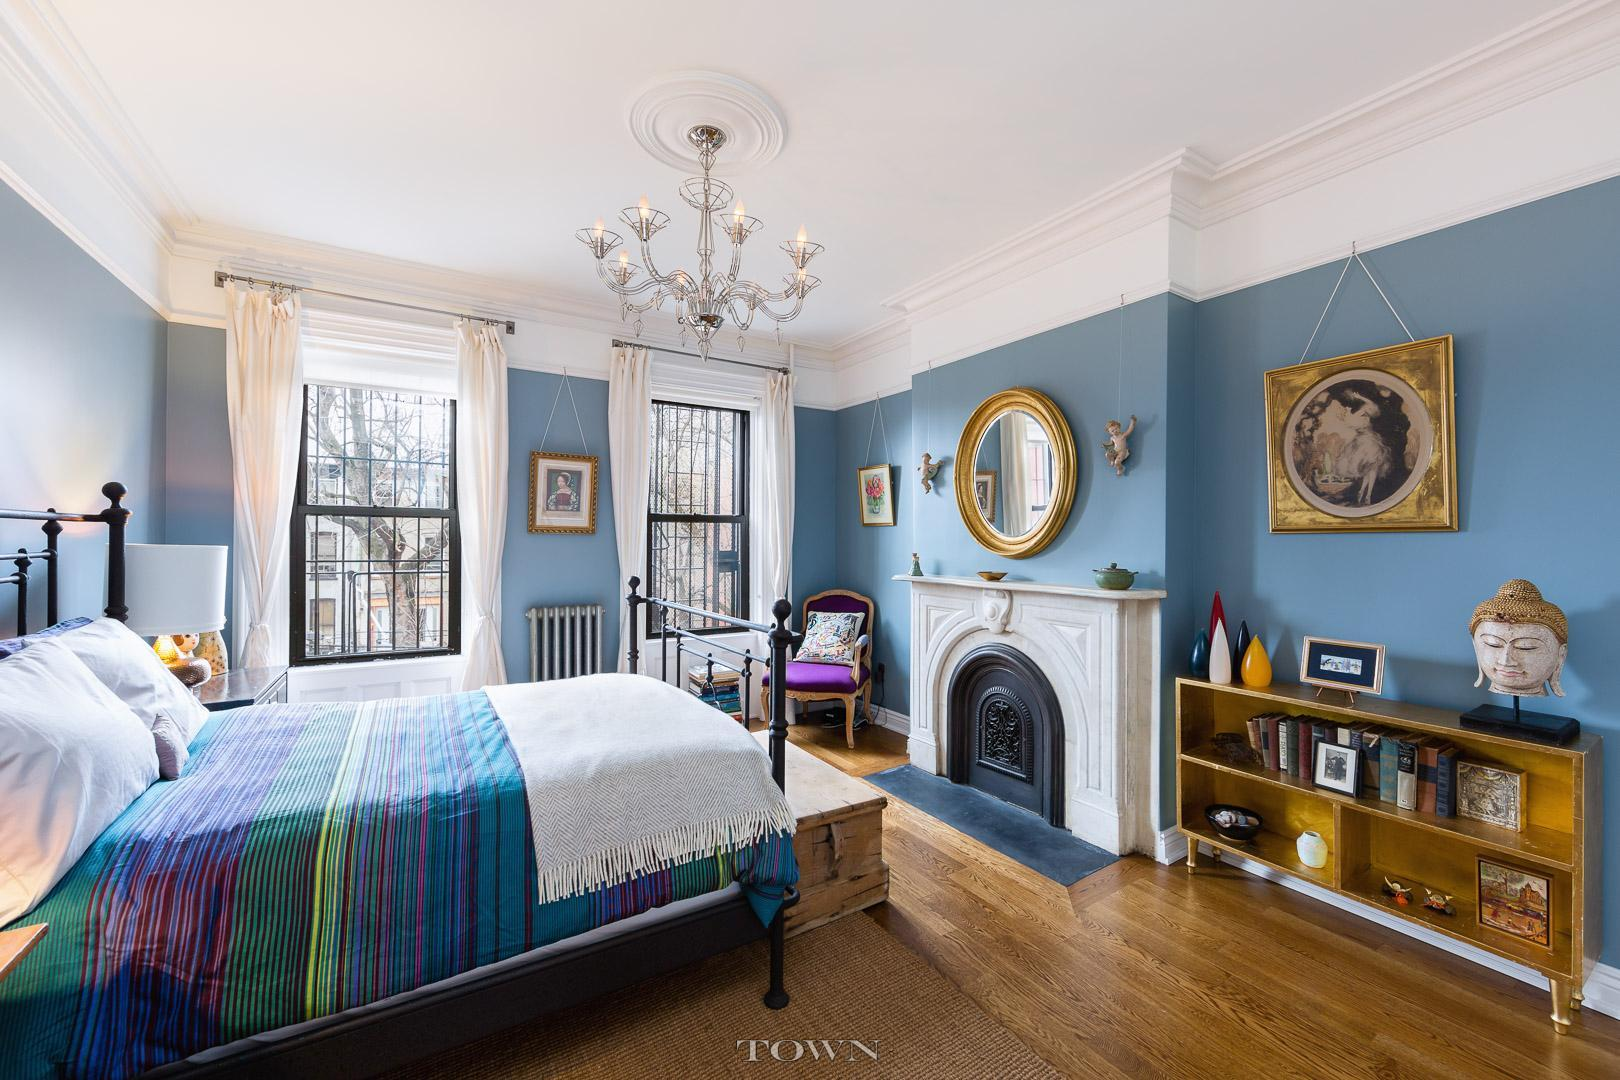 17 madison street, bedroom, bed-stuy, townhouse